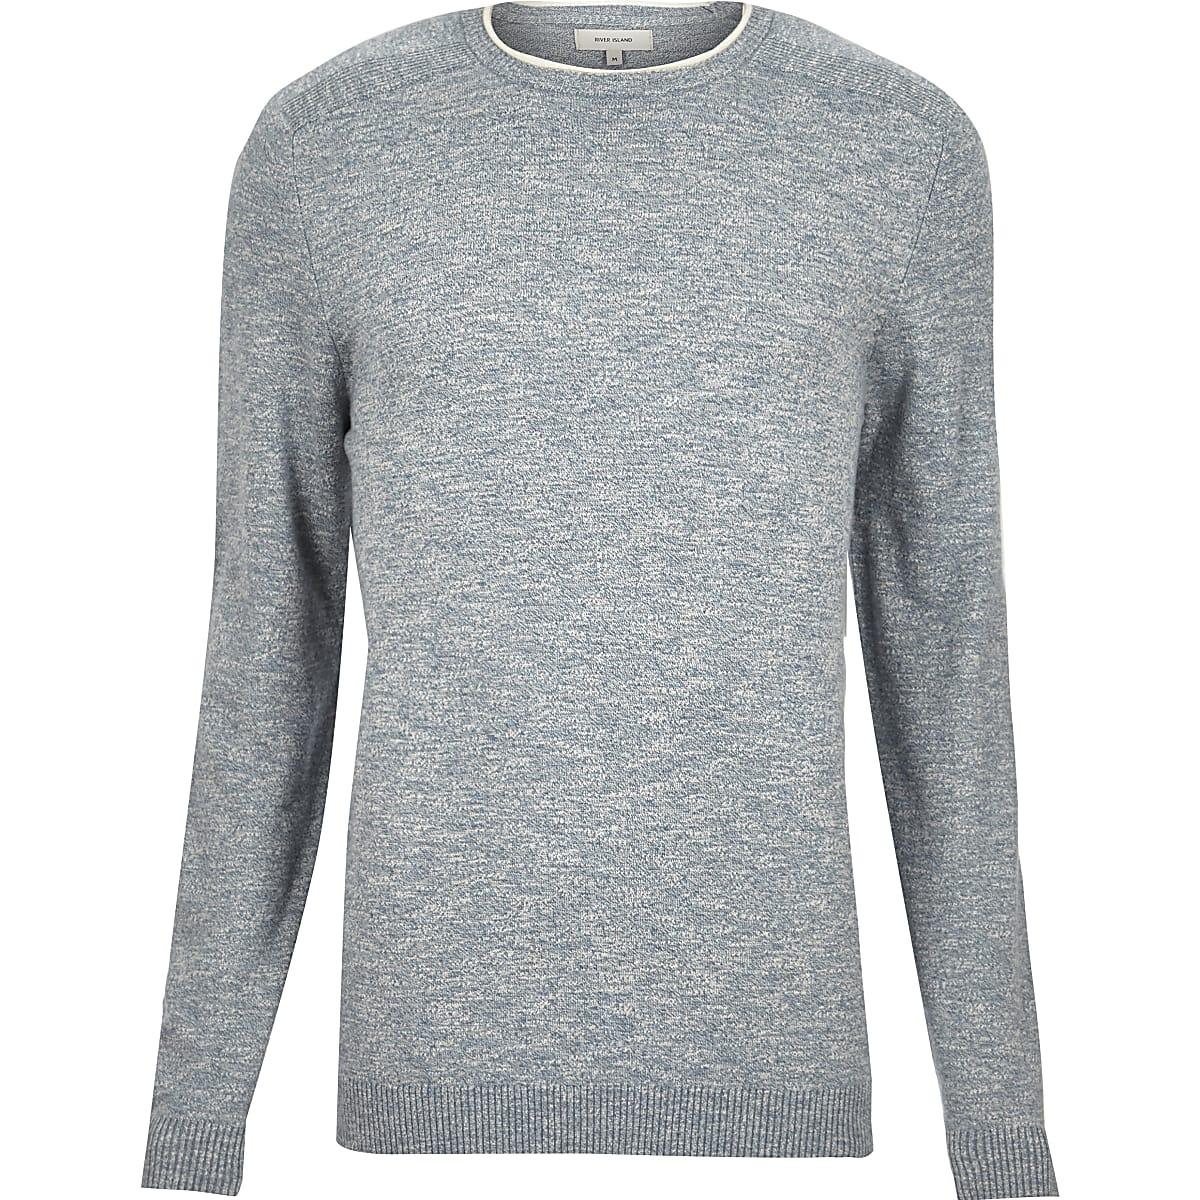 Light blue crew neck sweater